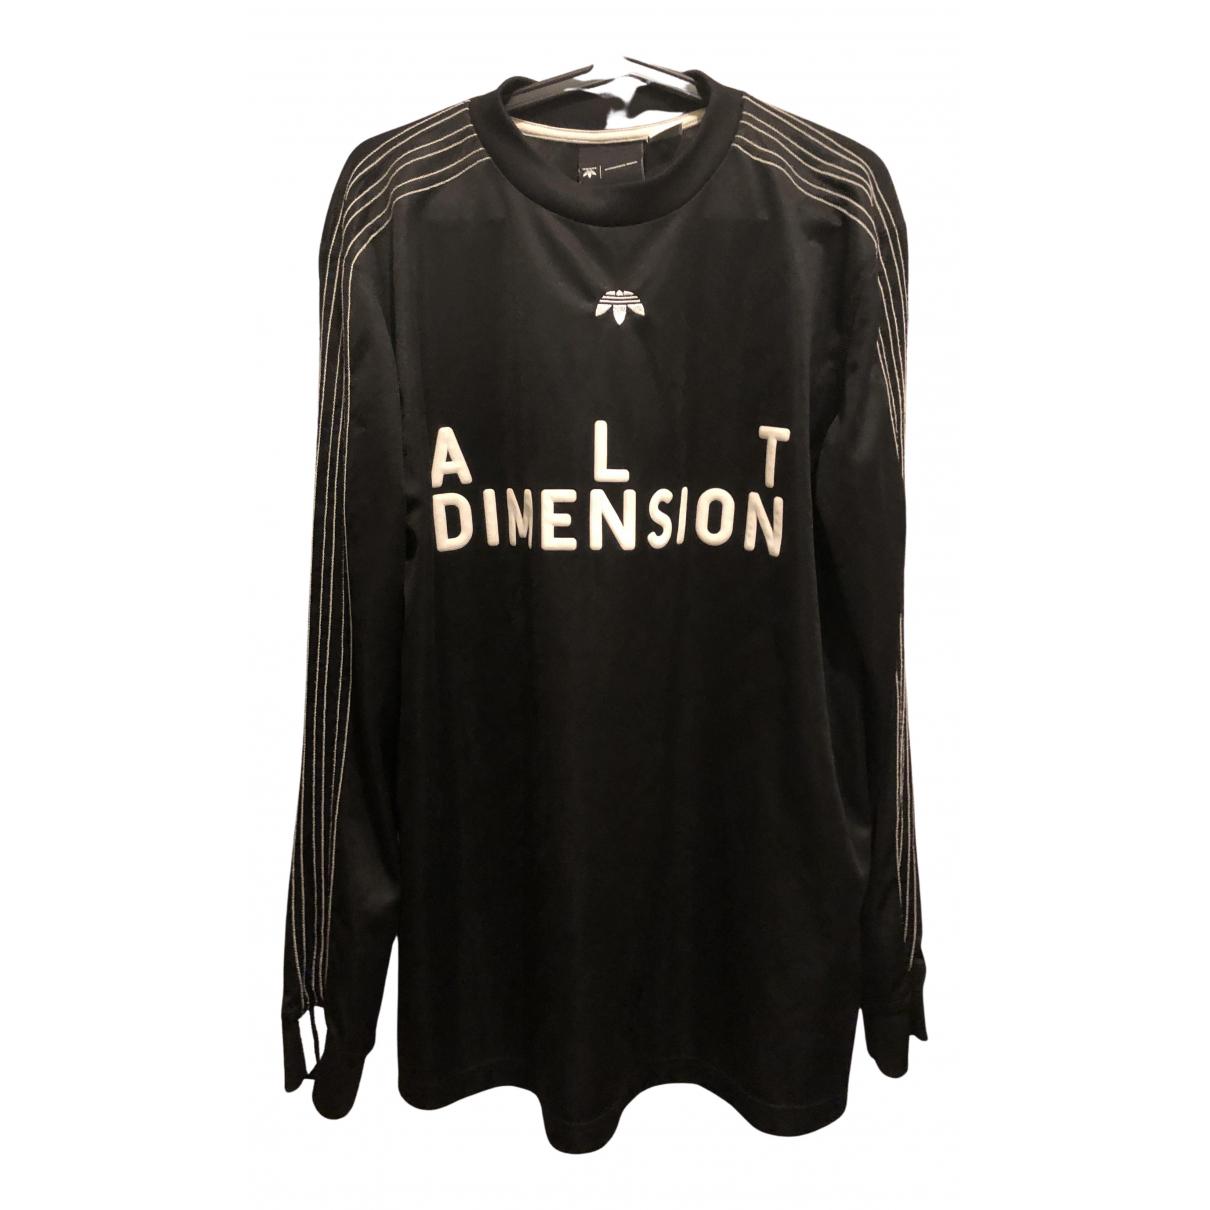 Alexander Wang N Black Knitwear & Sweatshirts for Men M International